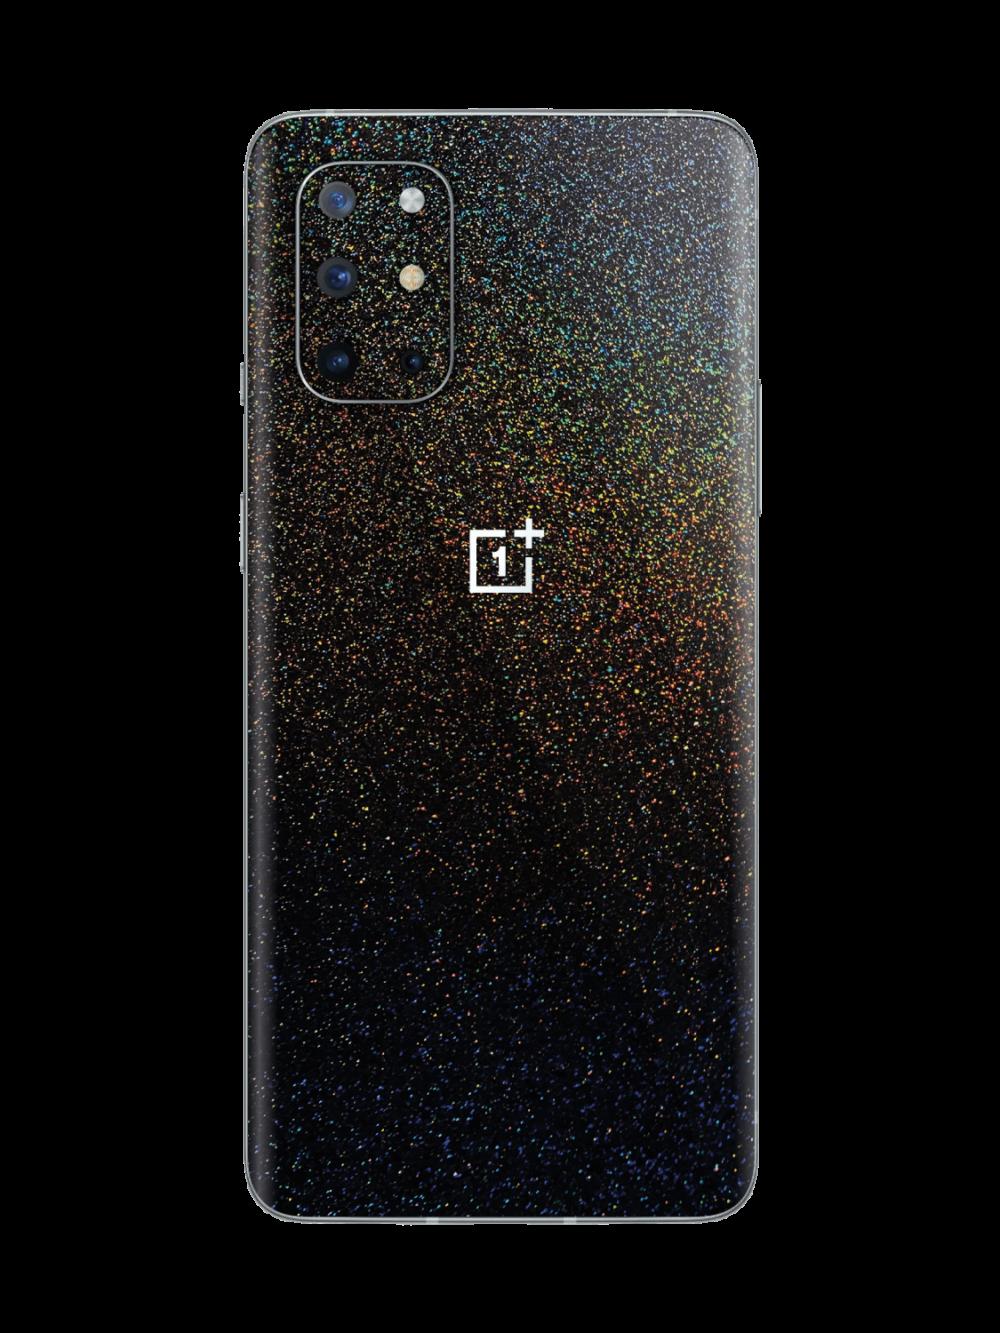 Cosmic Morpheus Glossy Skin Wrap for OnePlus 8T